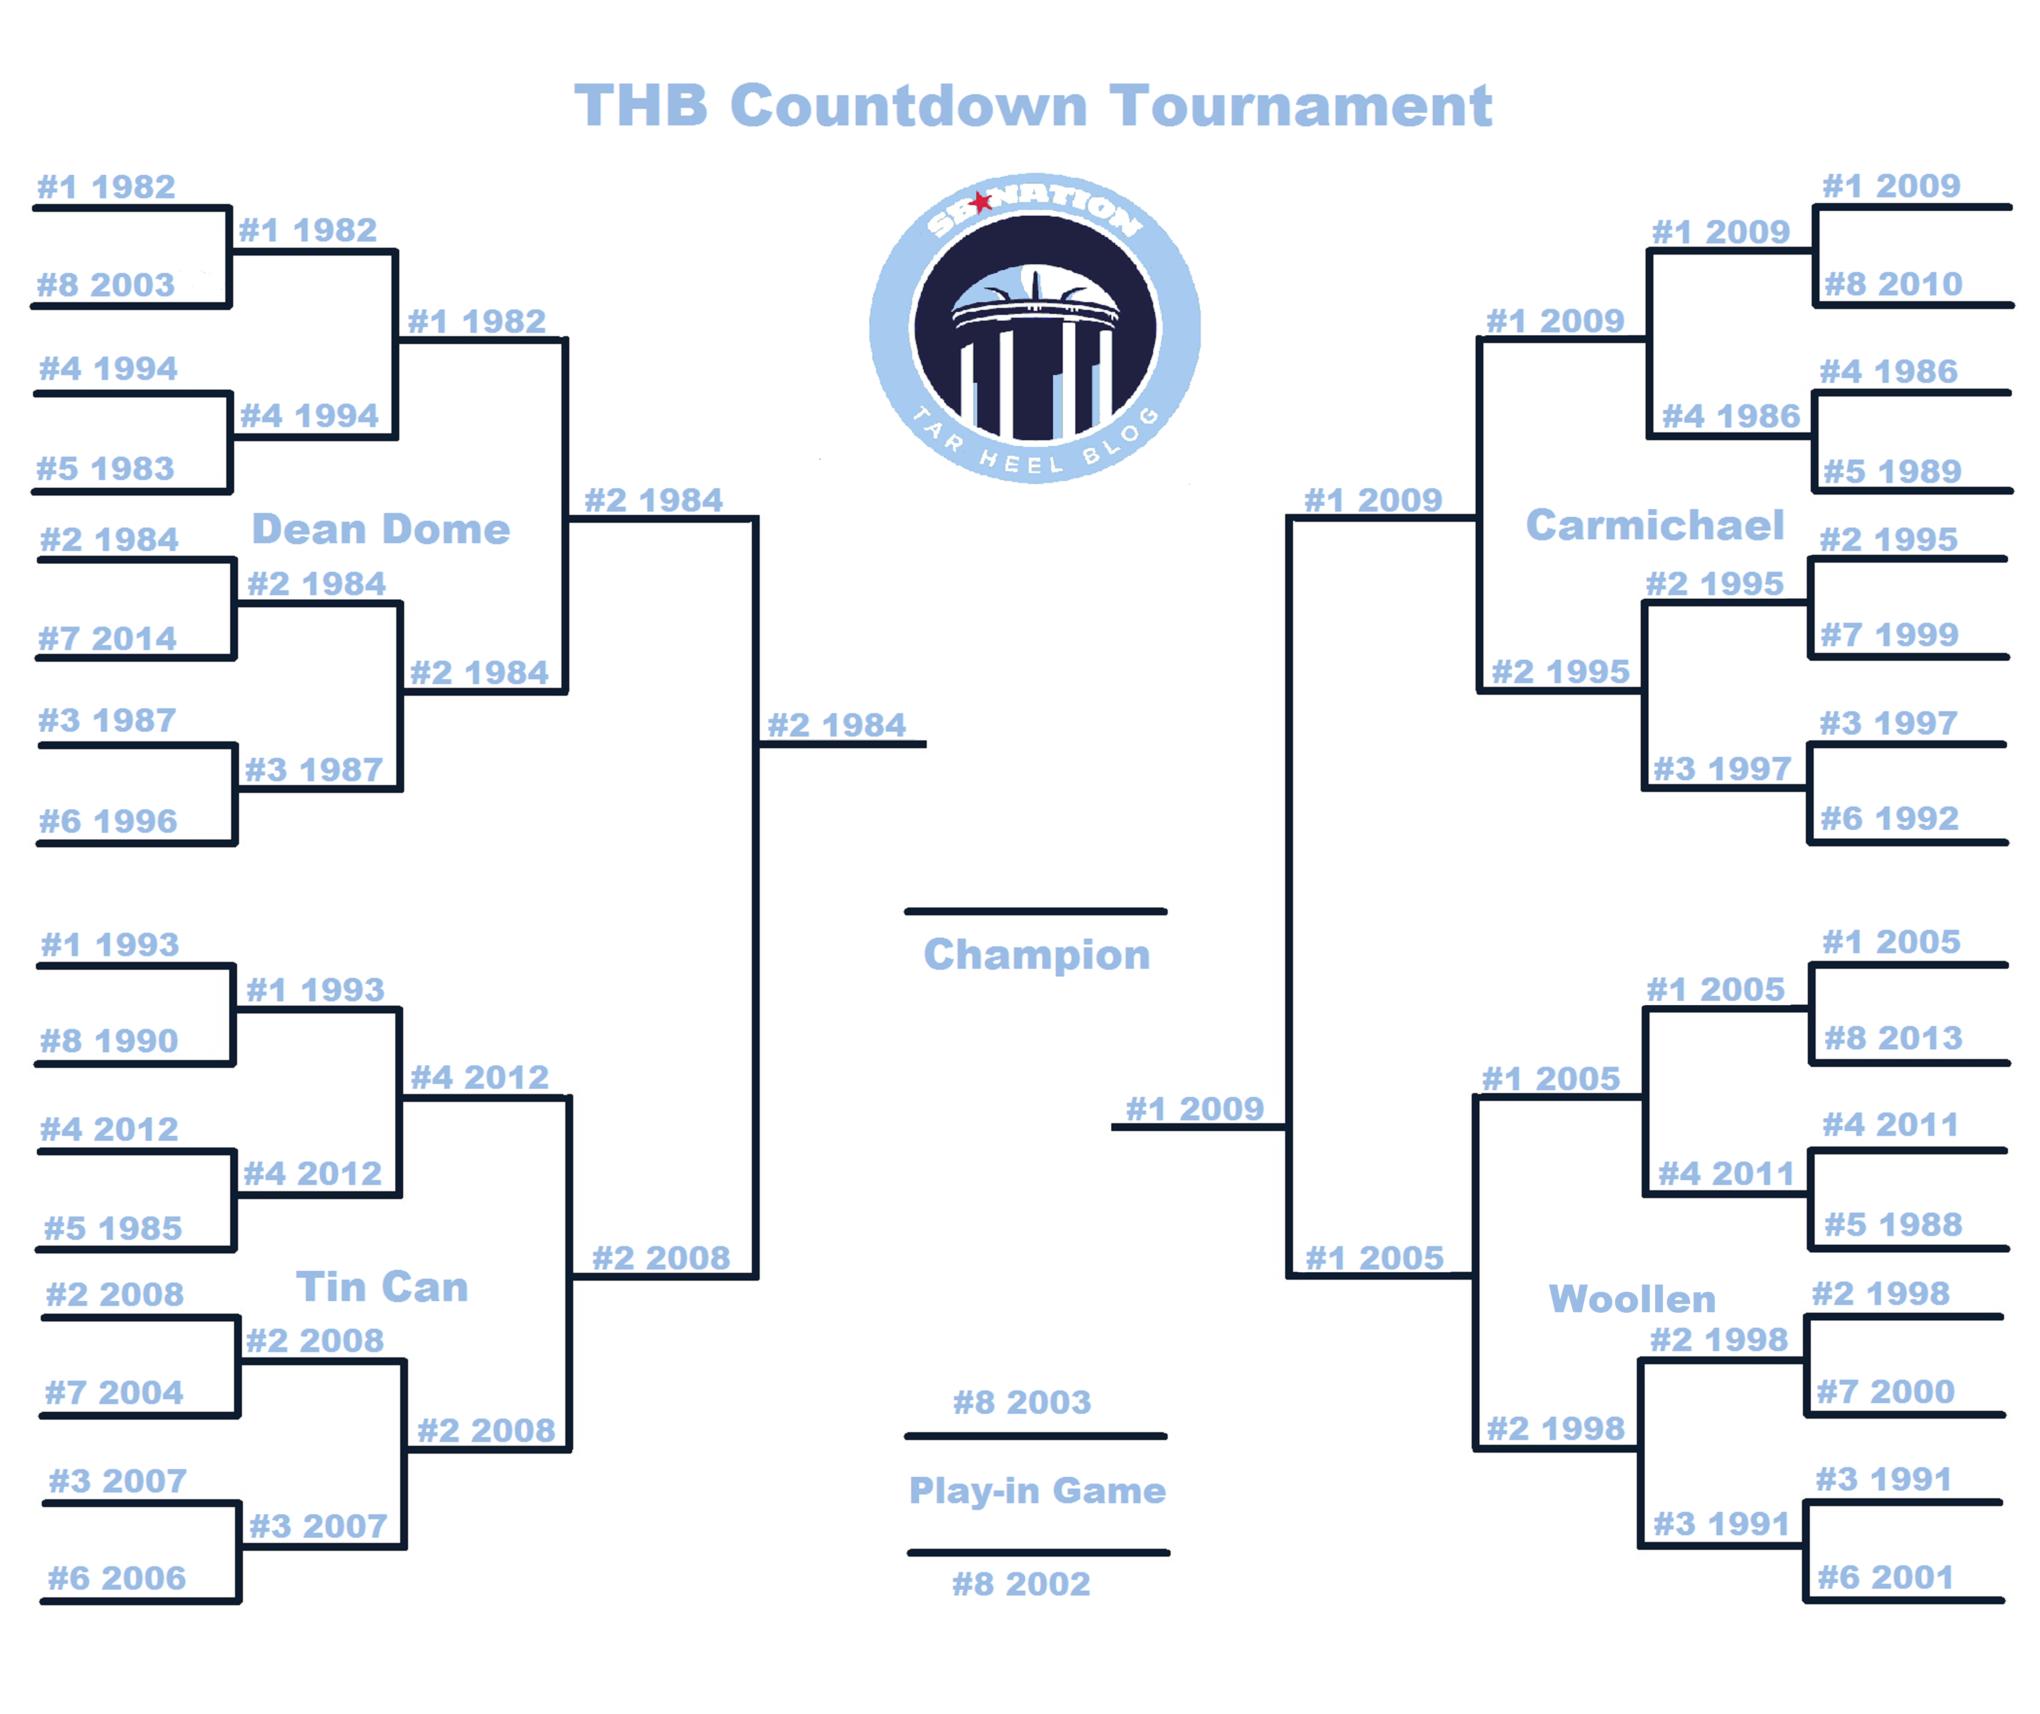 Thb_countdown_tournament-championship_medium